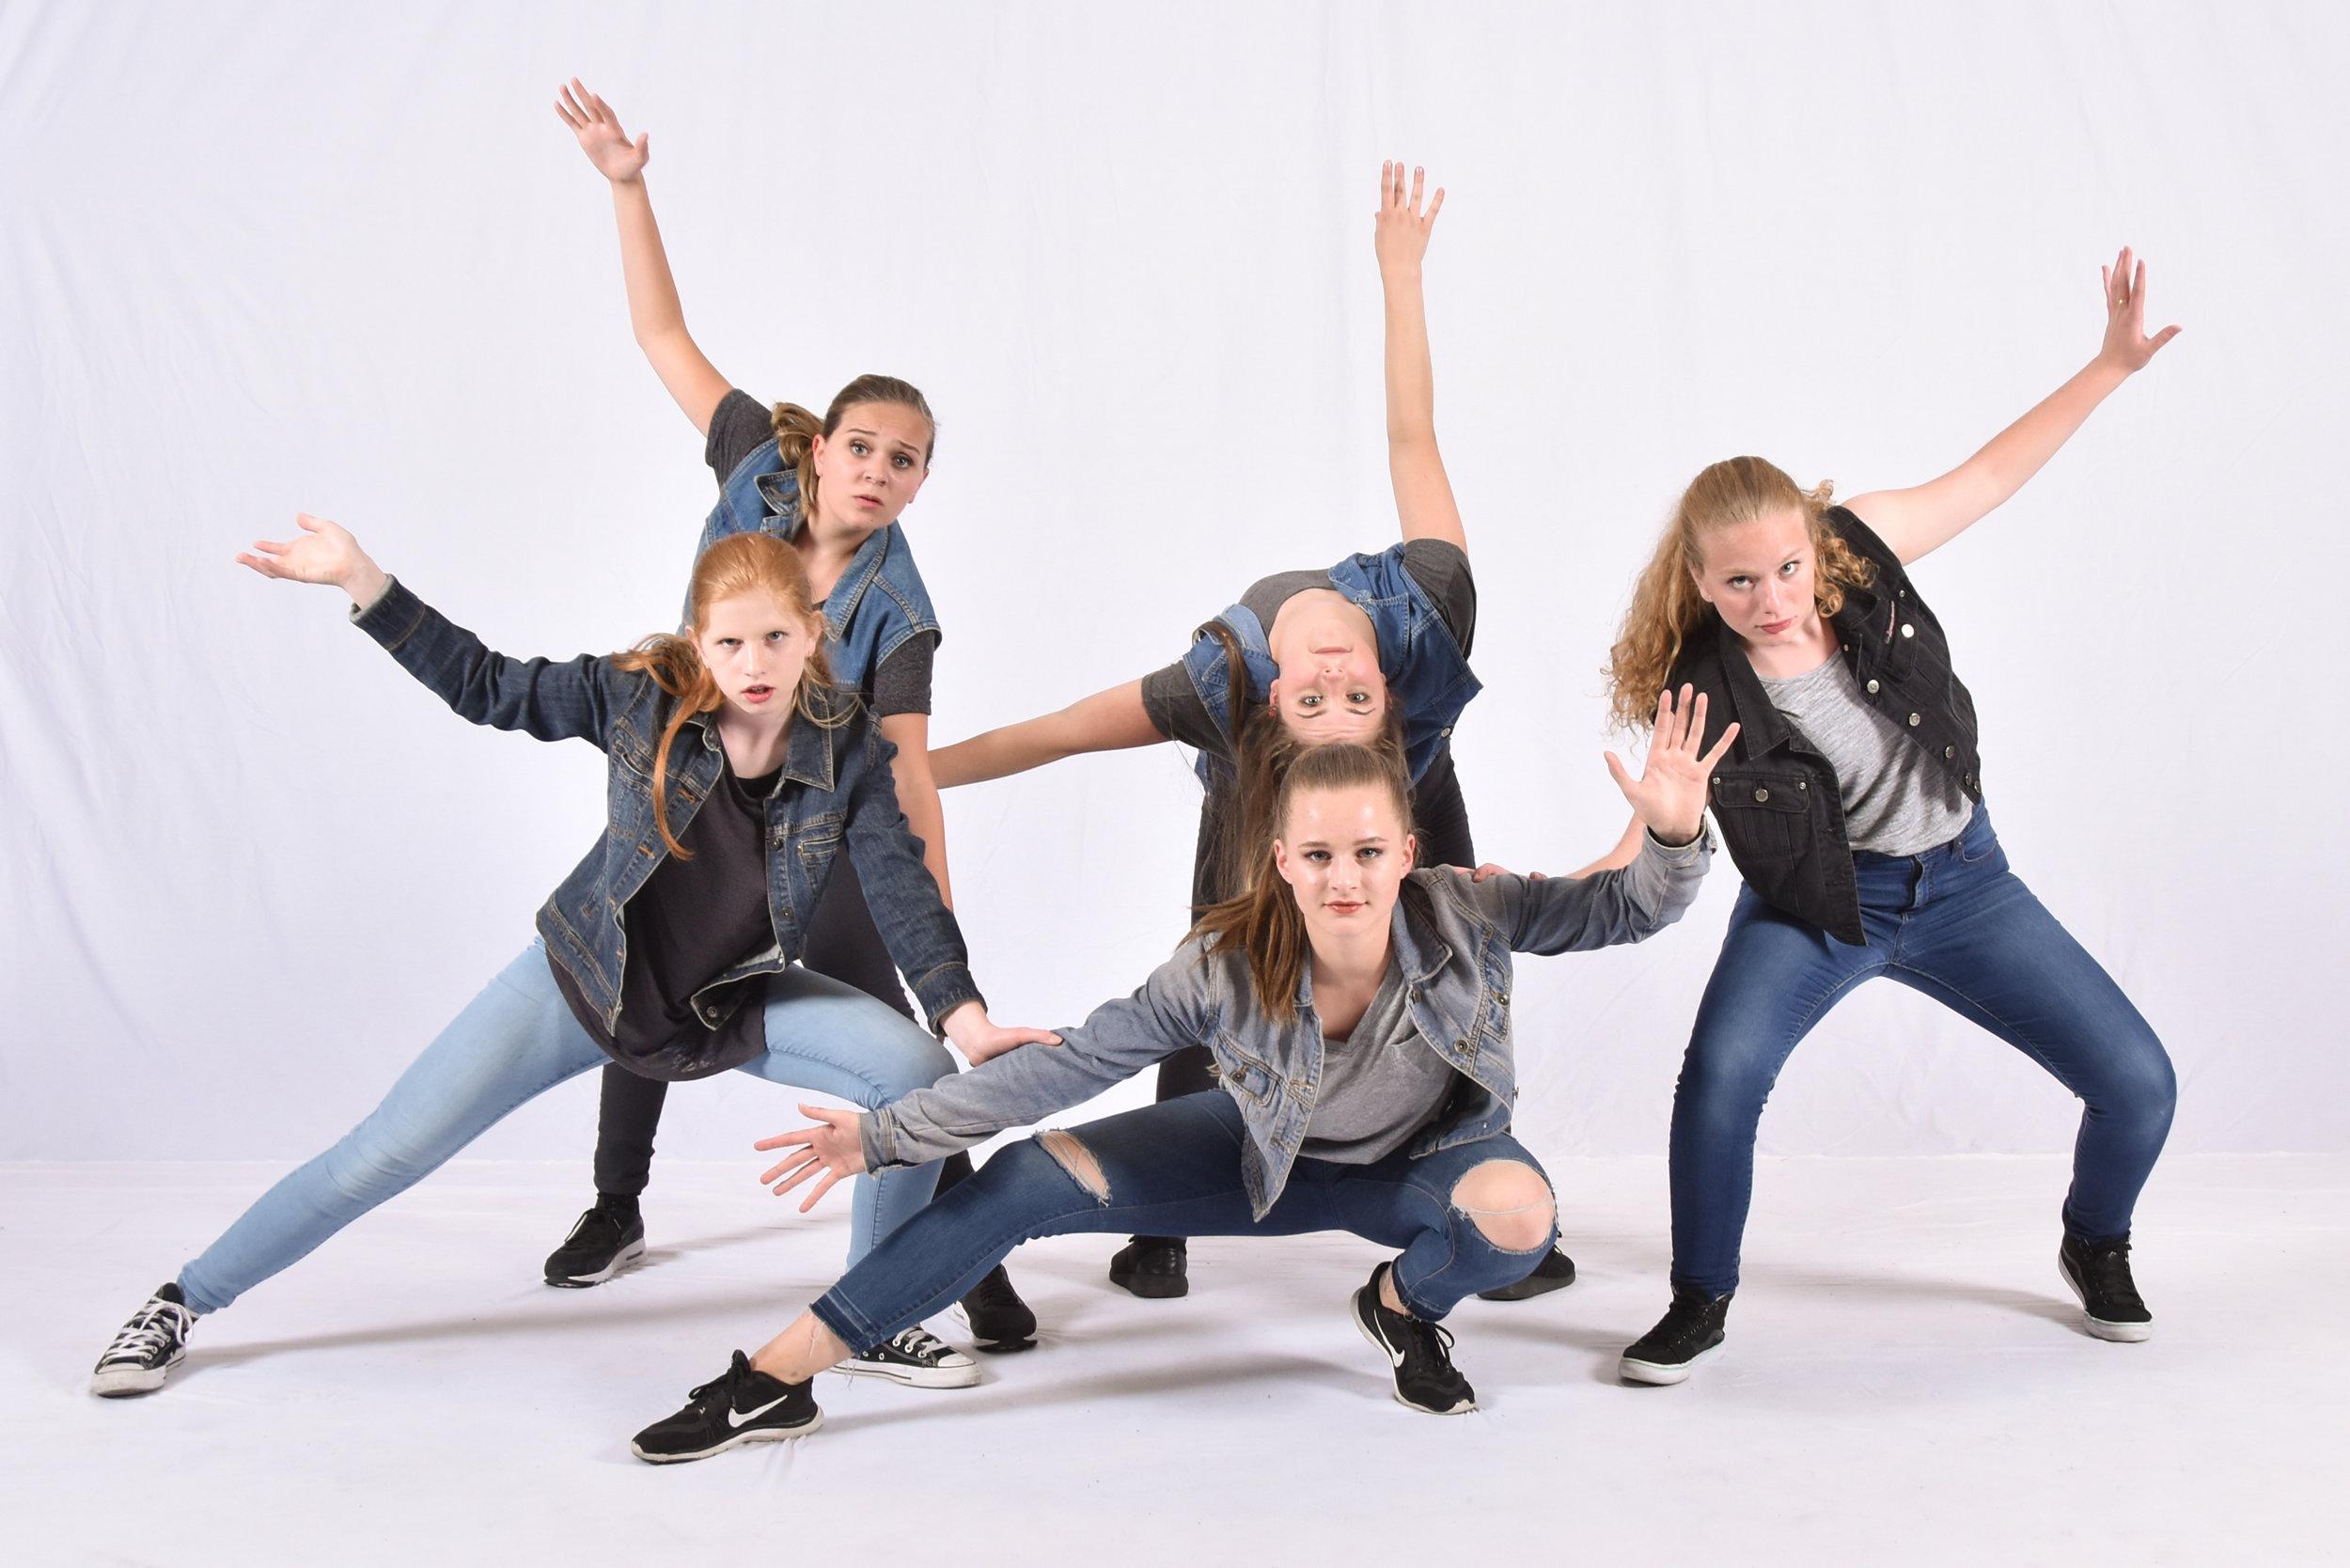 cool hip hop dancers in denim group pose